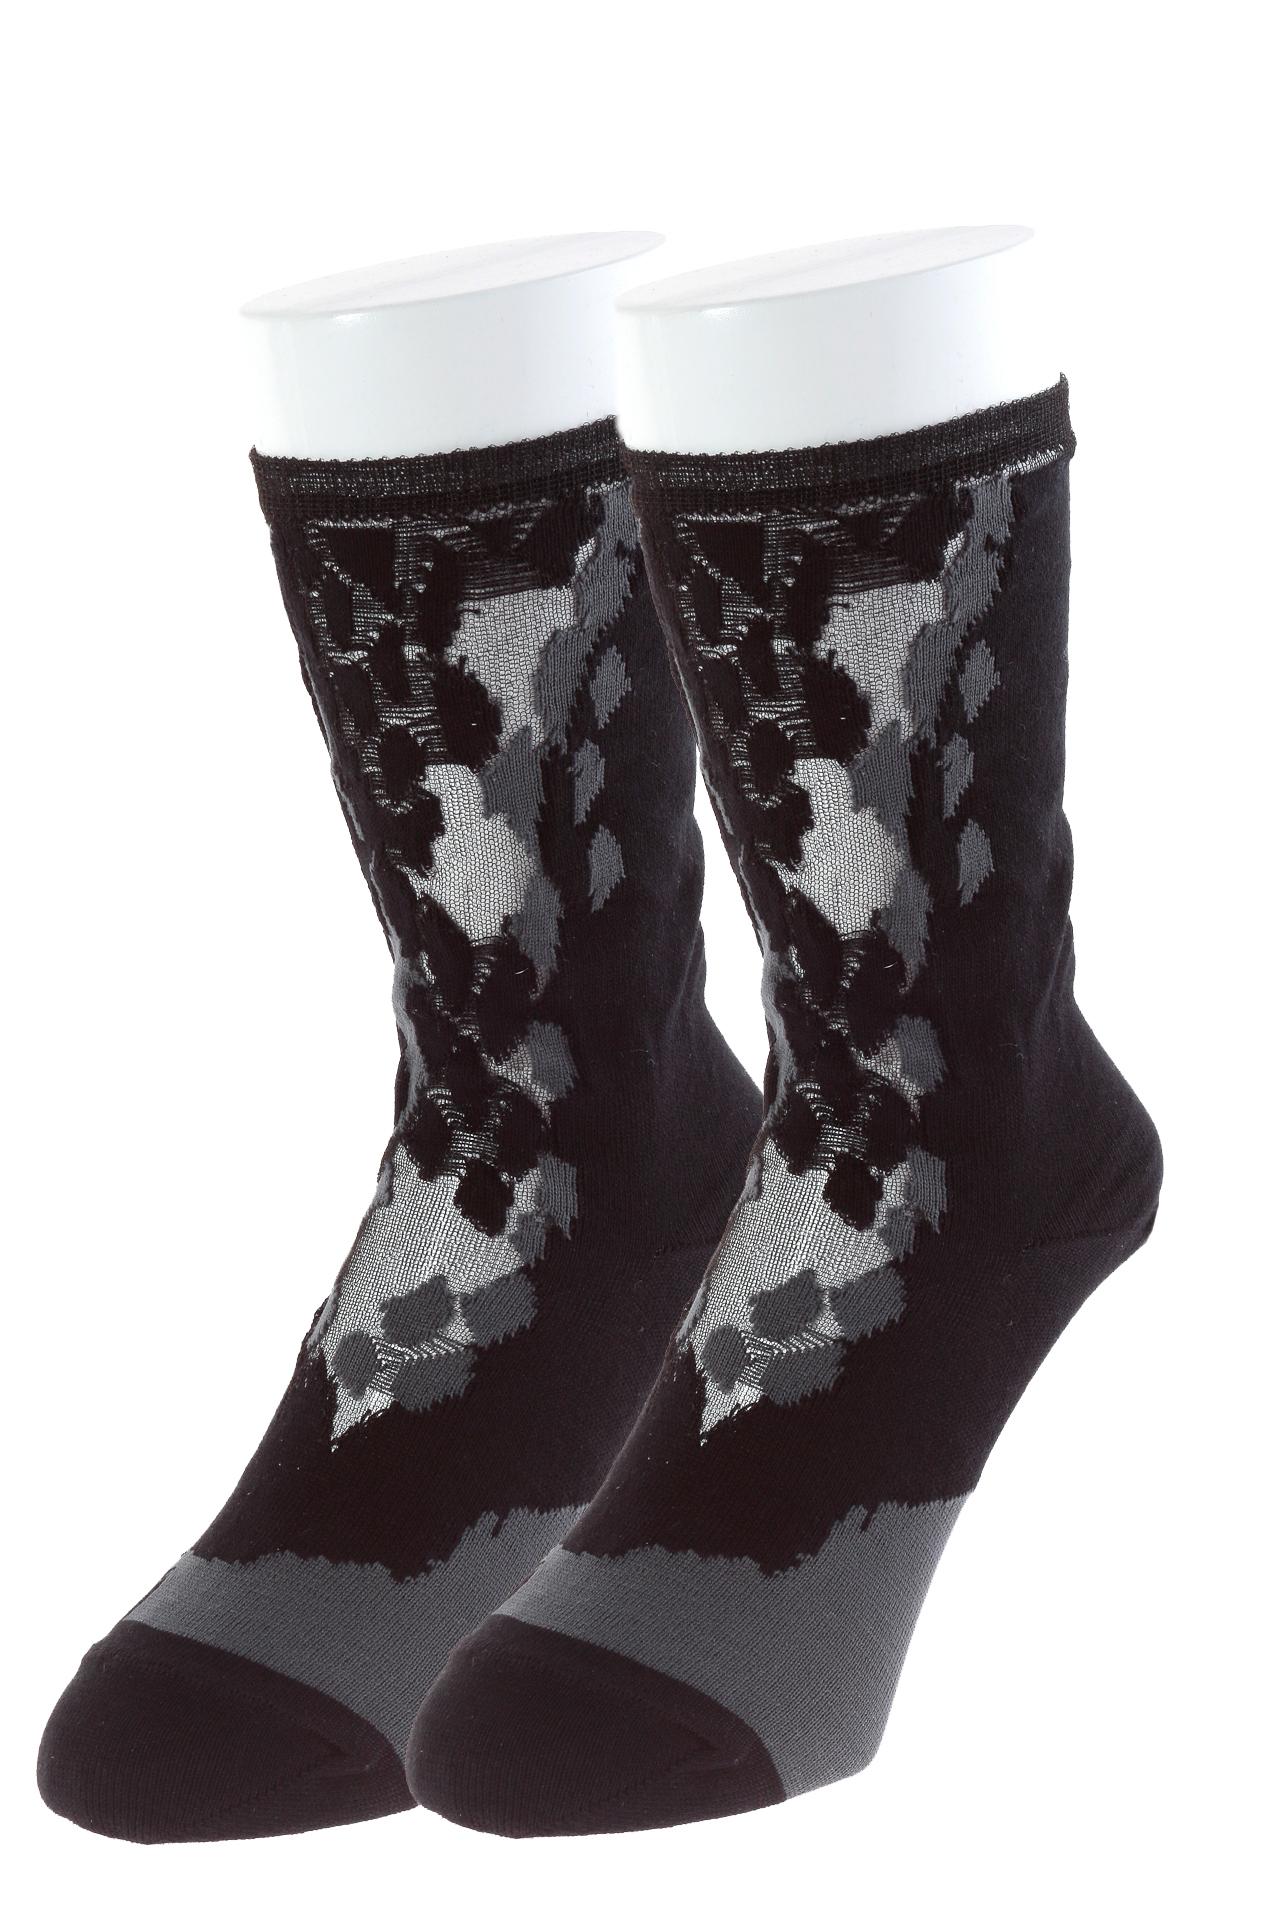 WEARABLE ART 東京SOCKS オリジナル靴下 BLACK[送料別/税込]